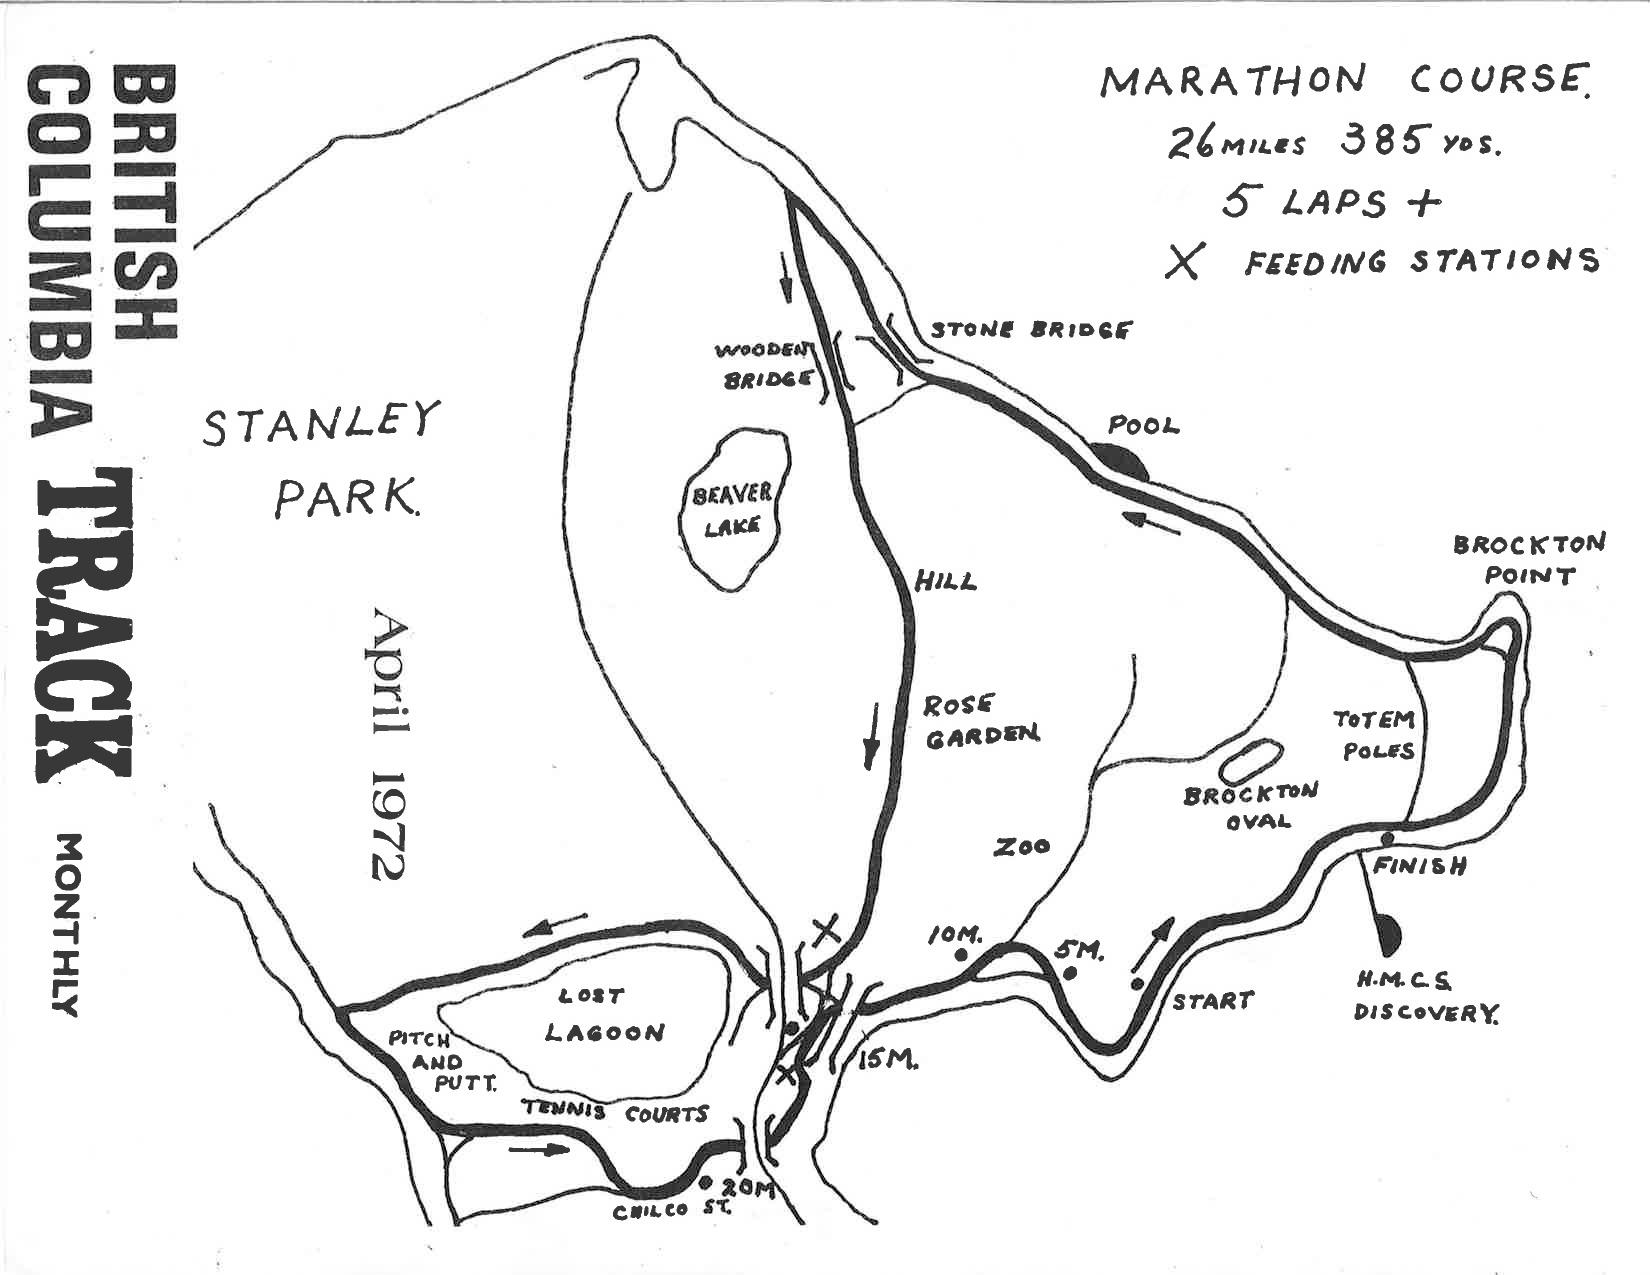 1979, 1980, 1981, 1982, 1983 Marathon Course. Vancouver Marathon RUNVAN